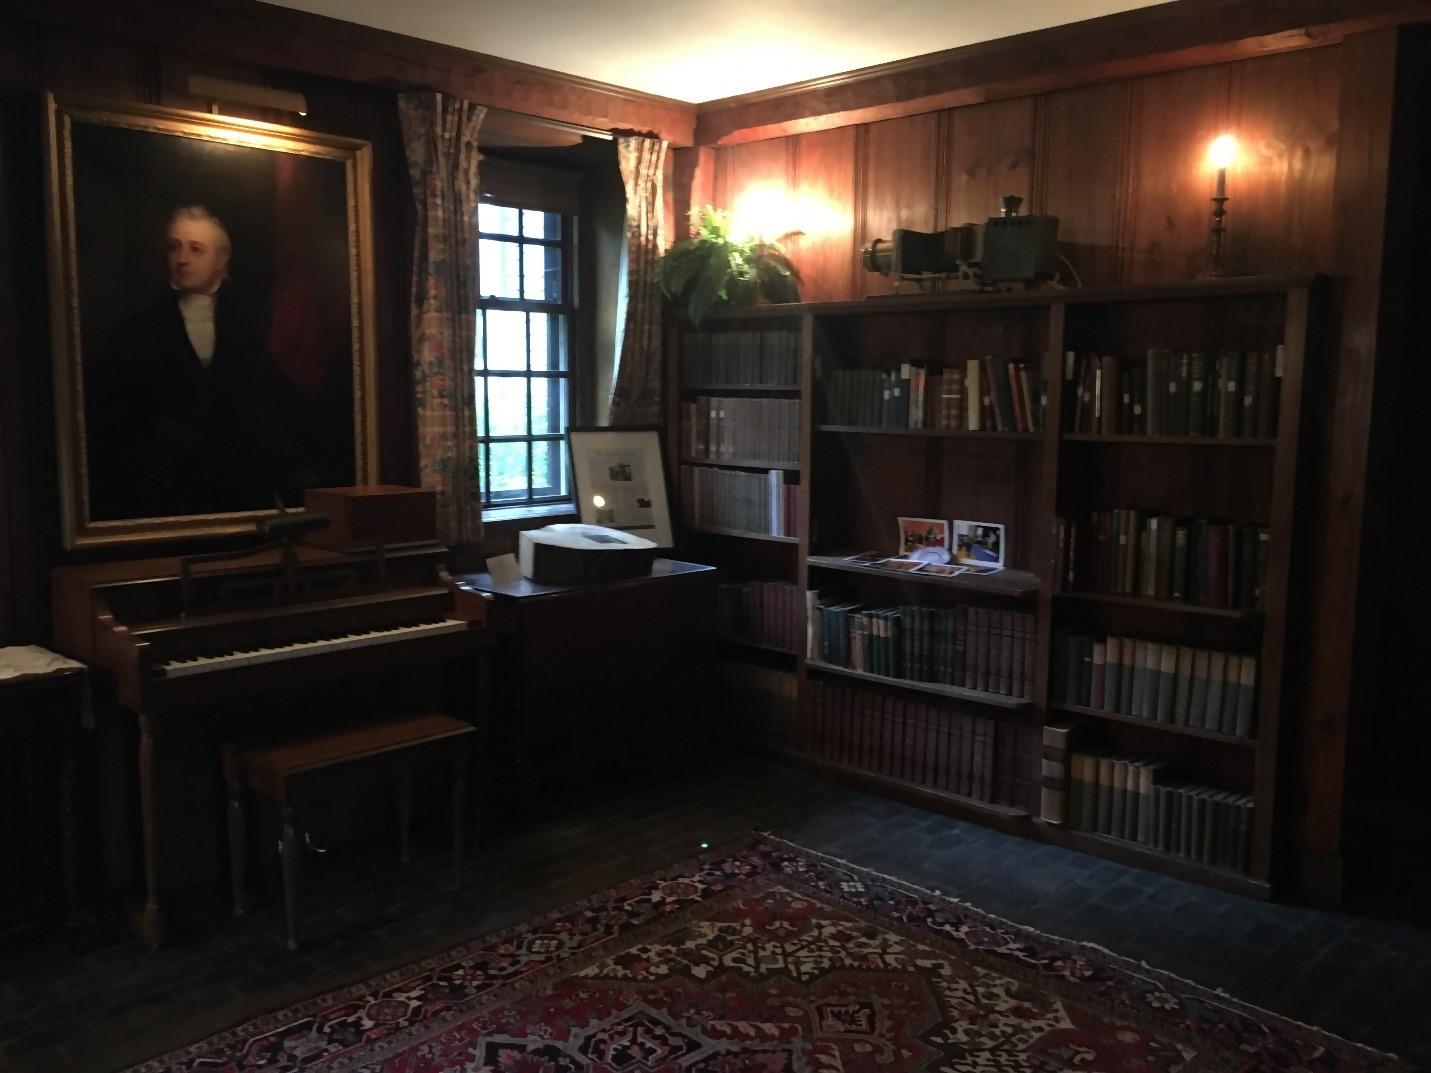 Hooper-Lee-Nichols House - Photo